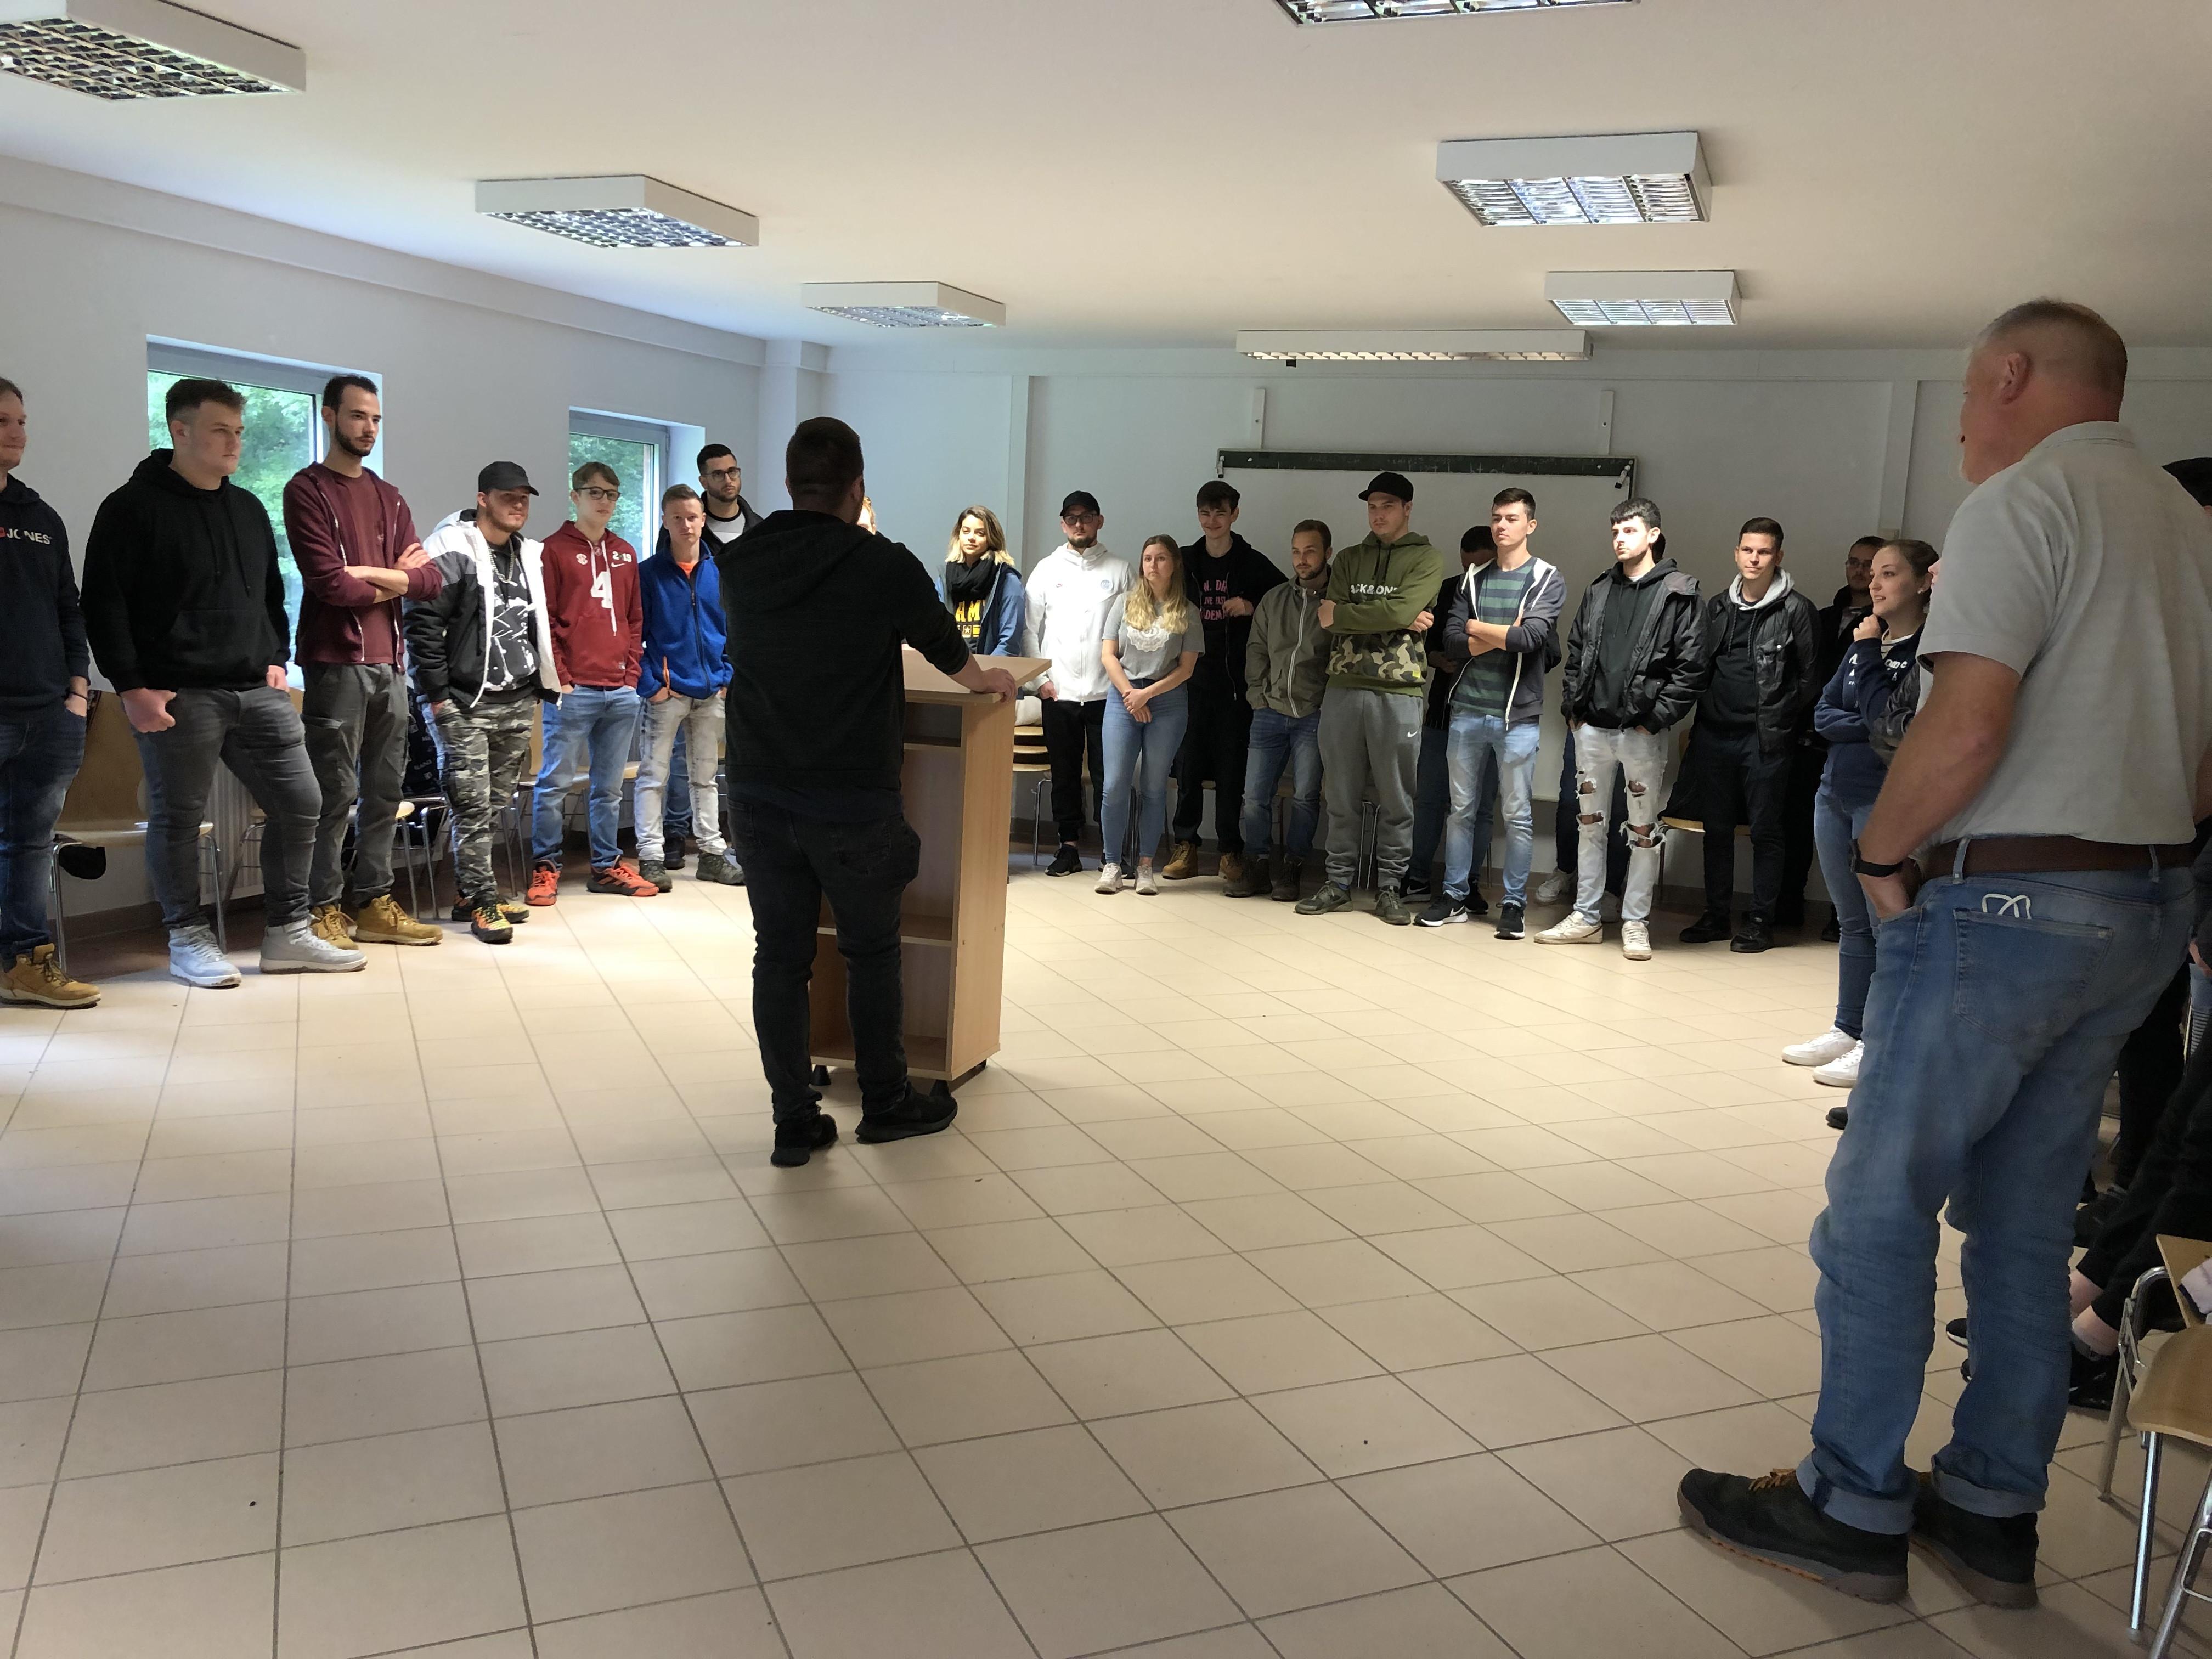 Vorstellungsrunde am ersten Tag des Teamcamps.